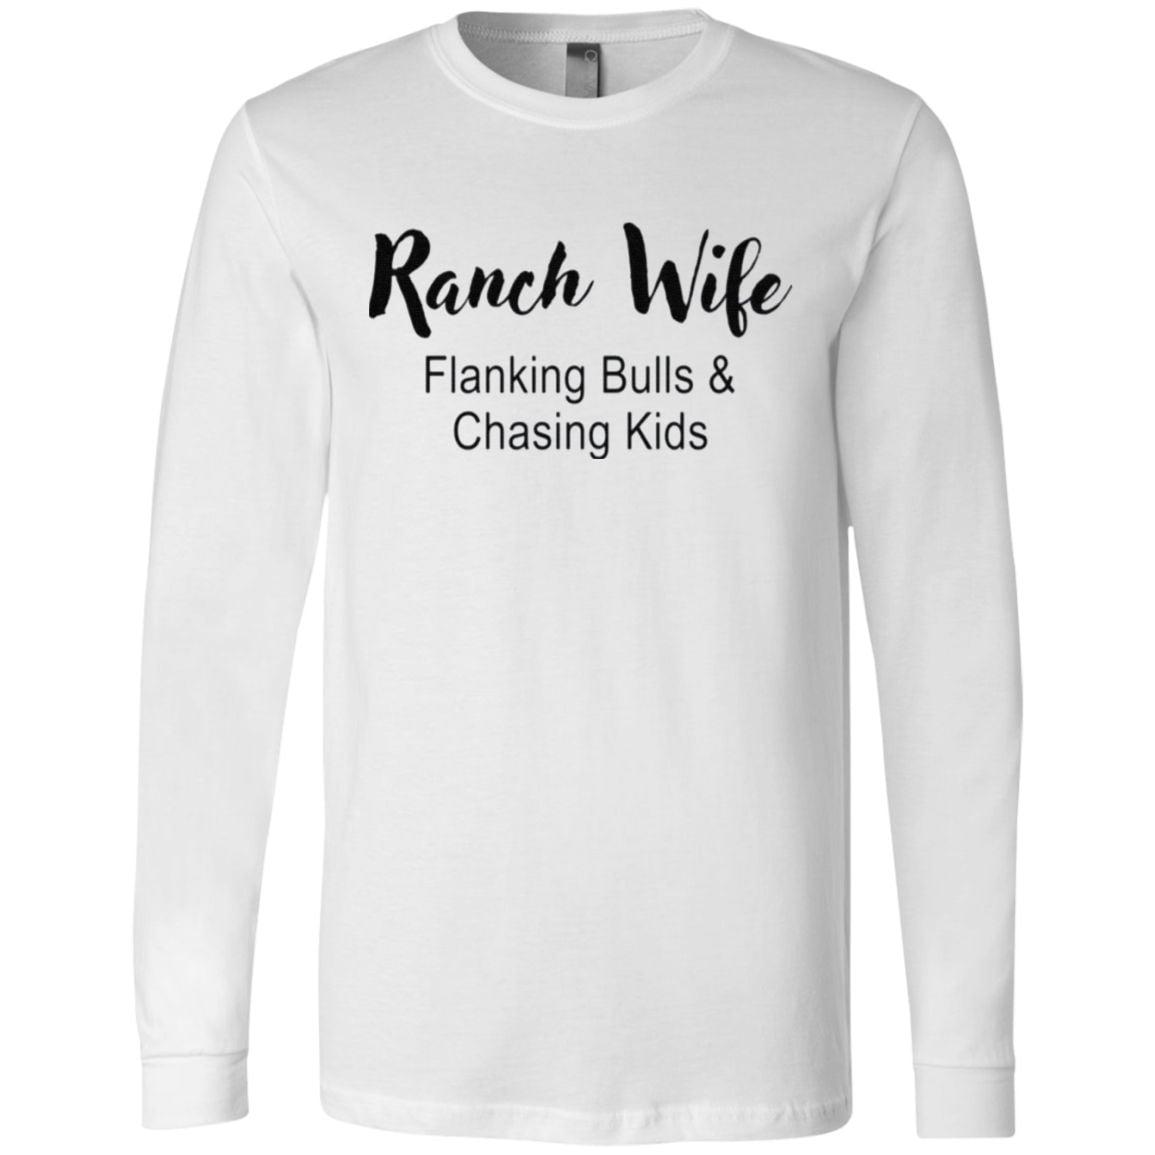 Ranch Wife Flanking Bulls Chasing Kids t shirt